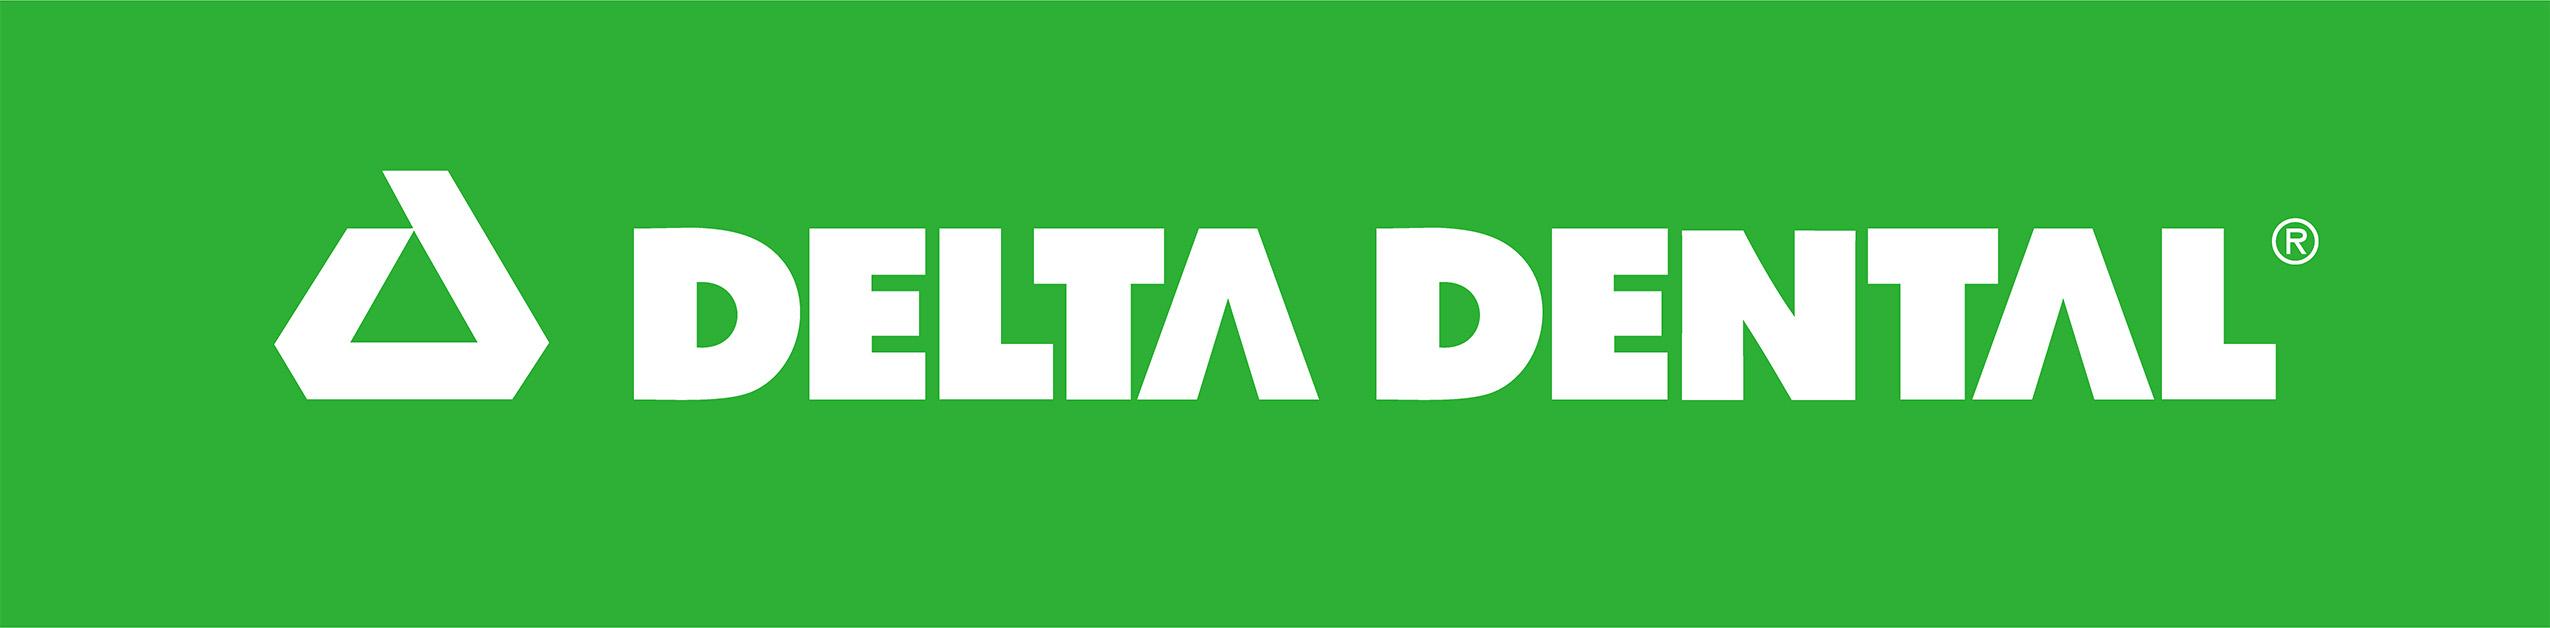 delta-dental.jpeg